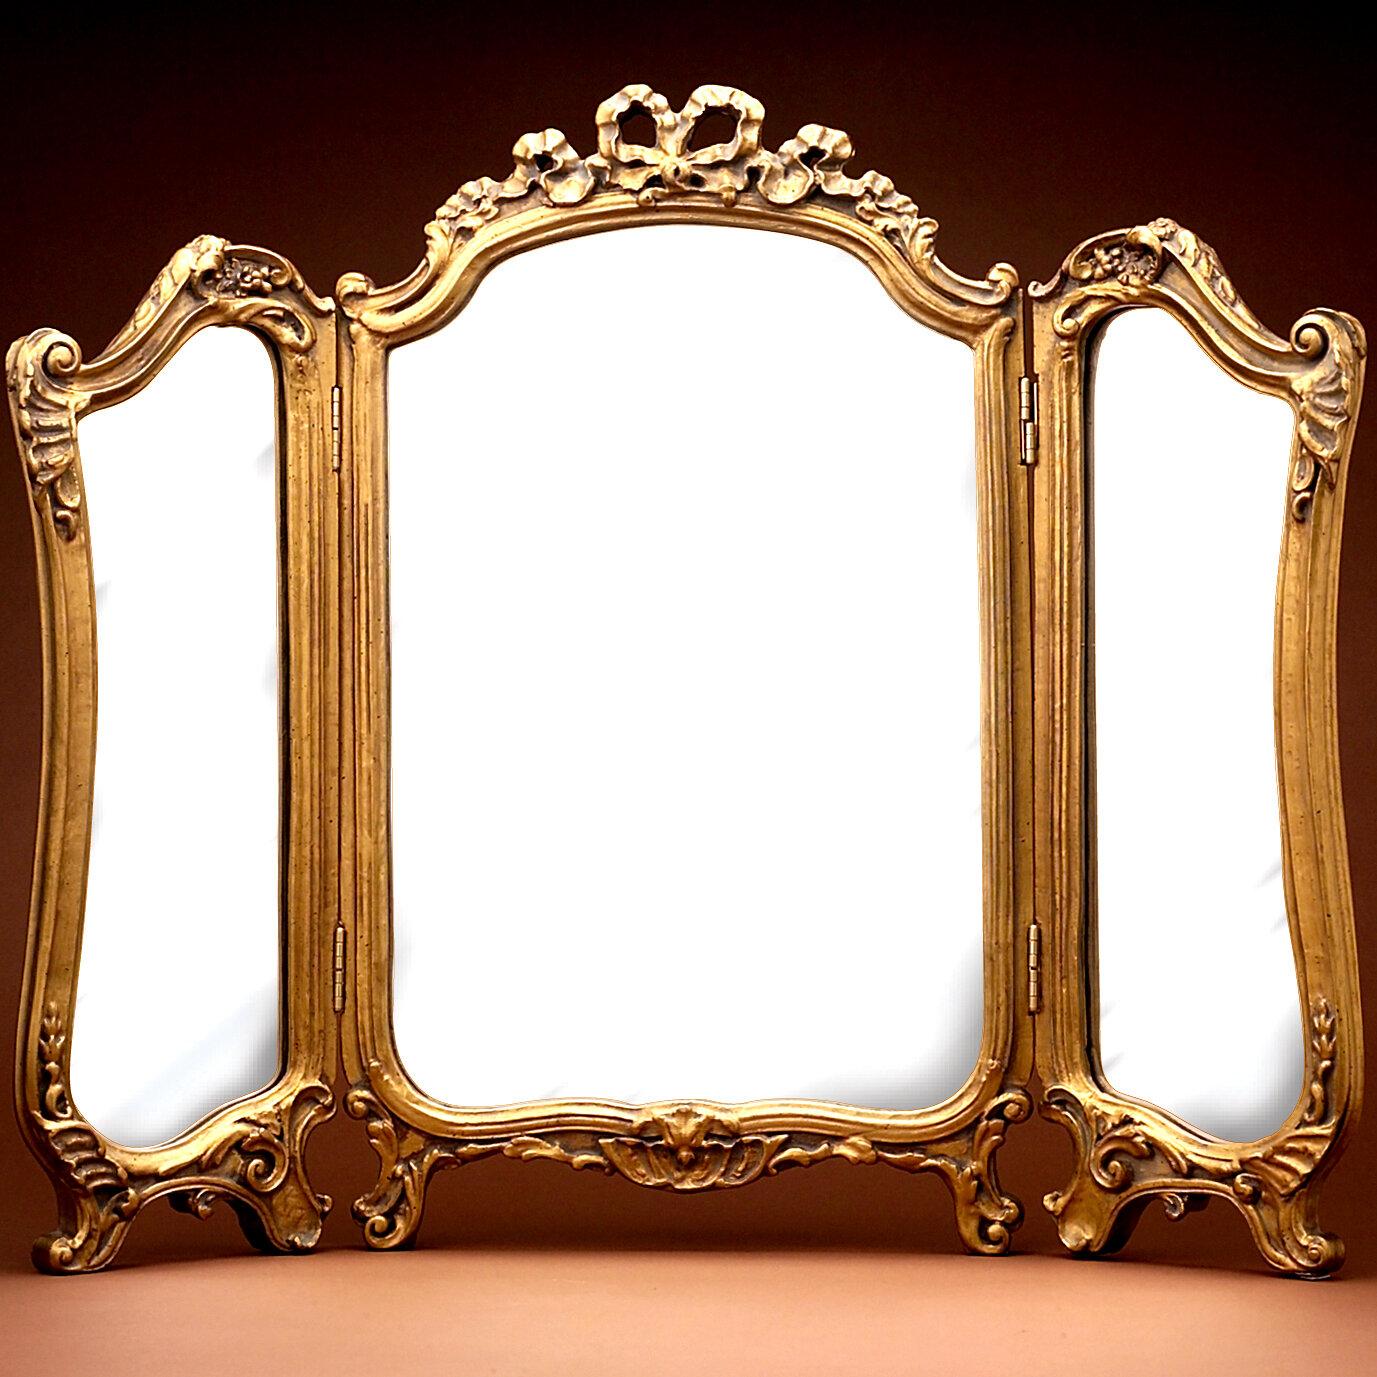 Astoria Grand Hahne Tri Fold Bathroom Vanity Mirror Reviews Wayfair